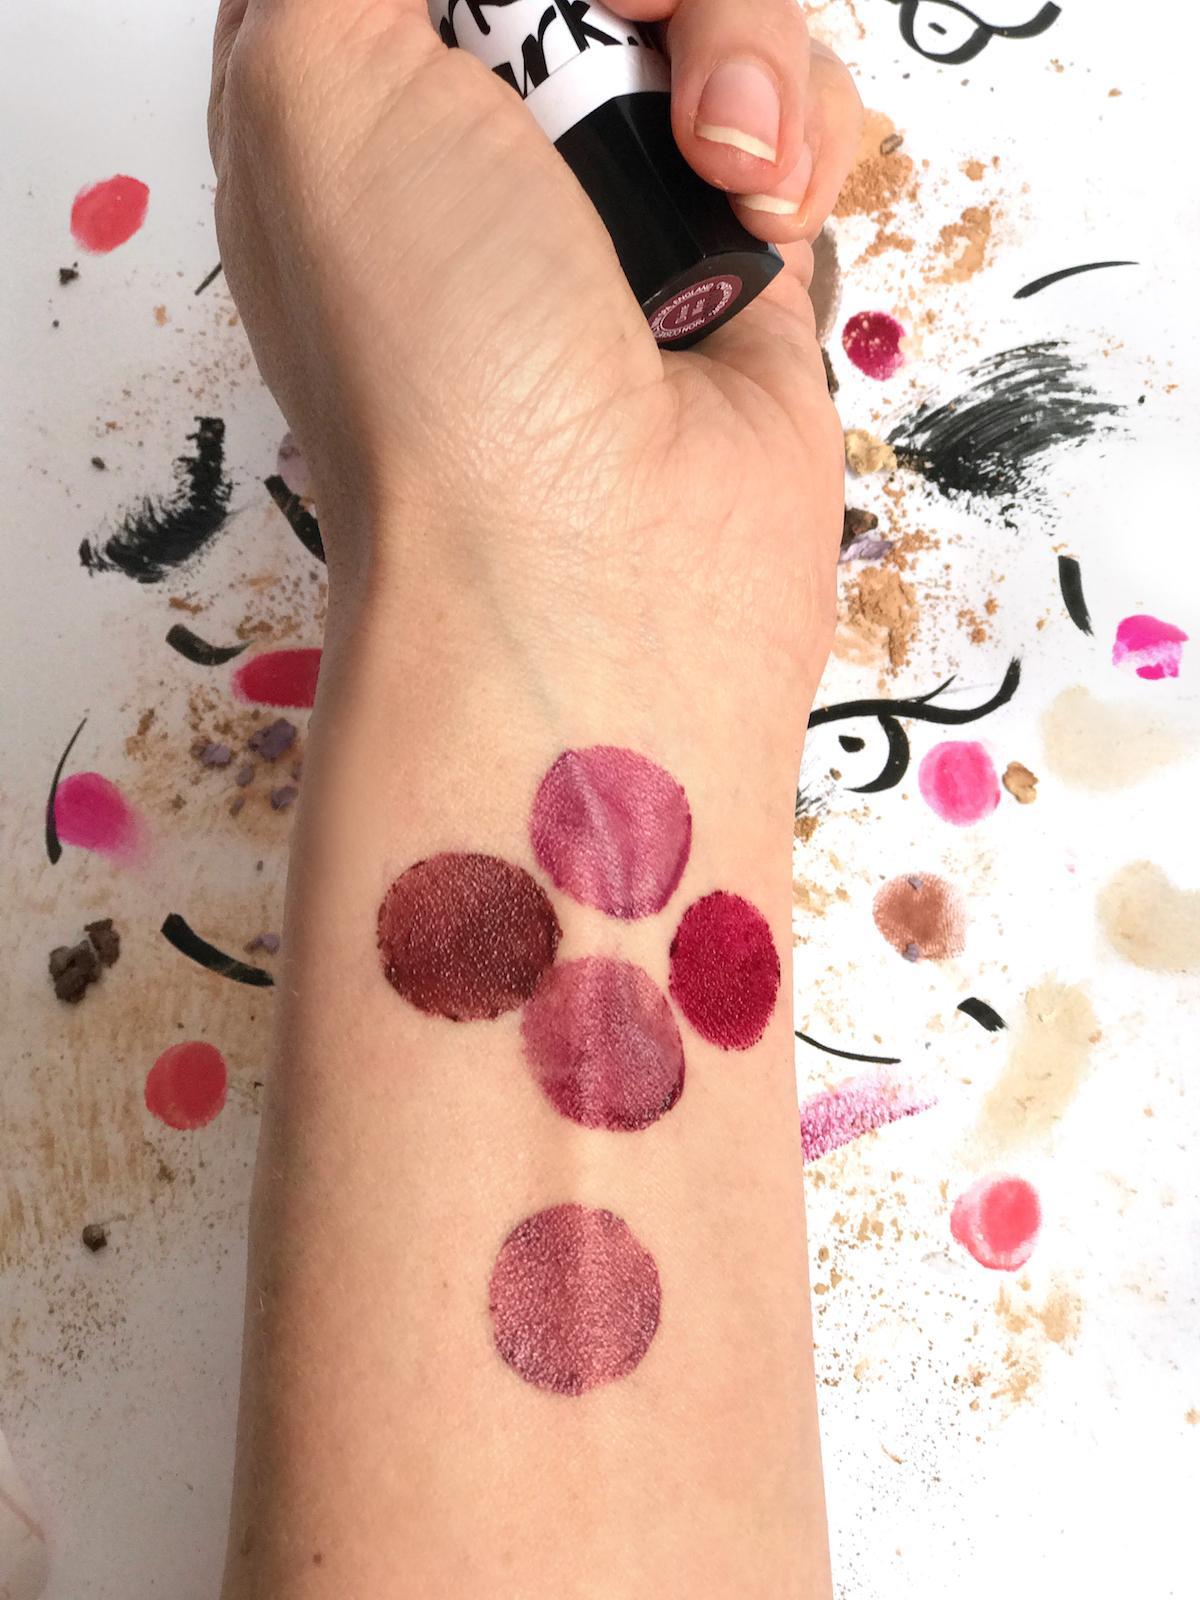 Avon Mark Lipstick Berry Tones Swatches Beautyfullblog